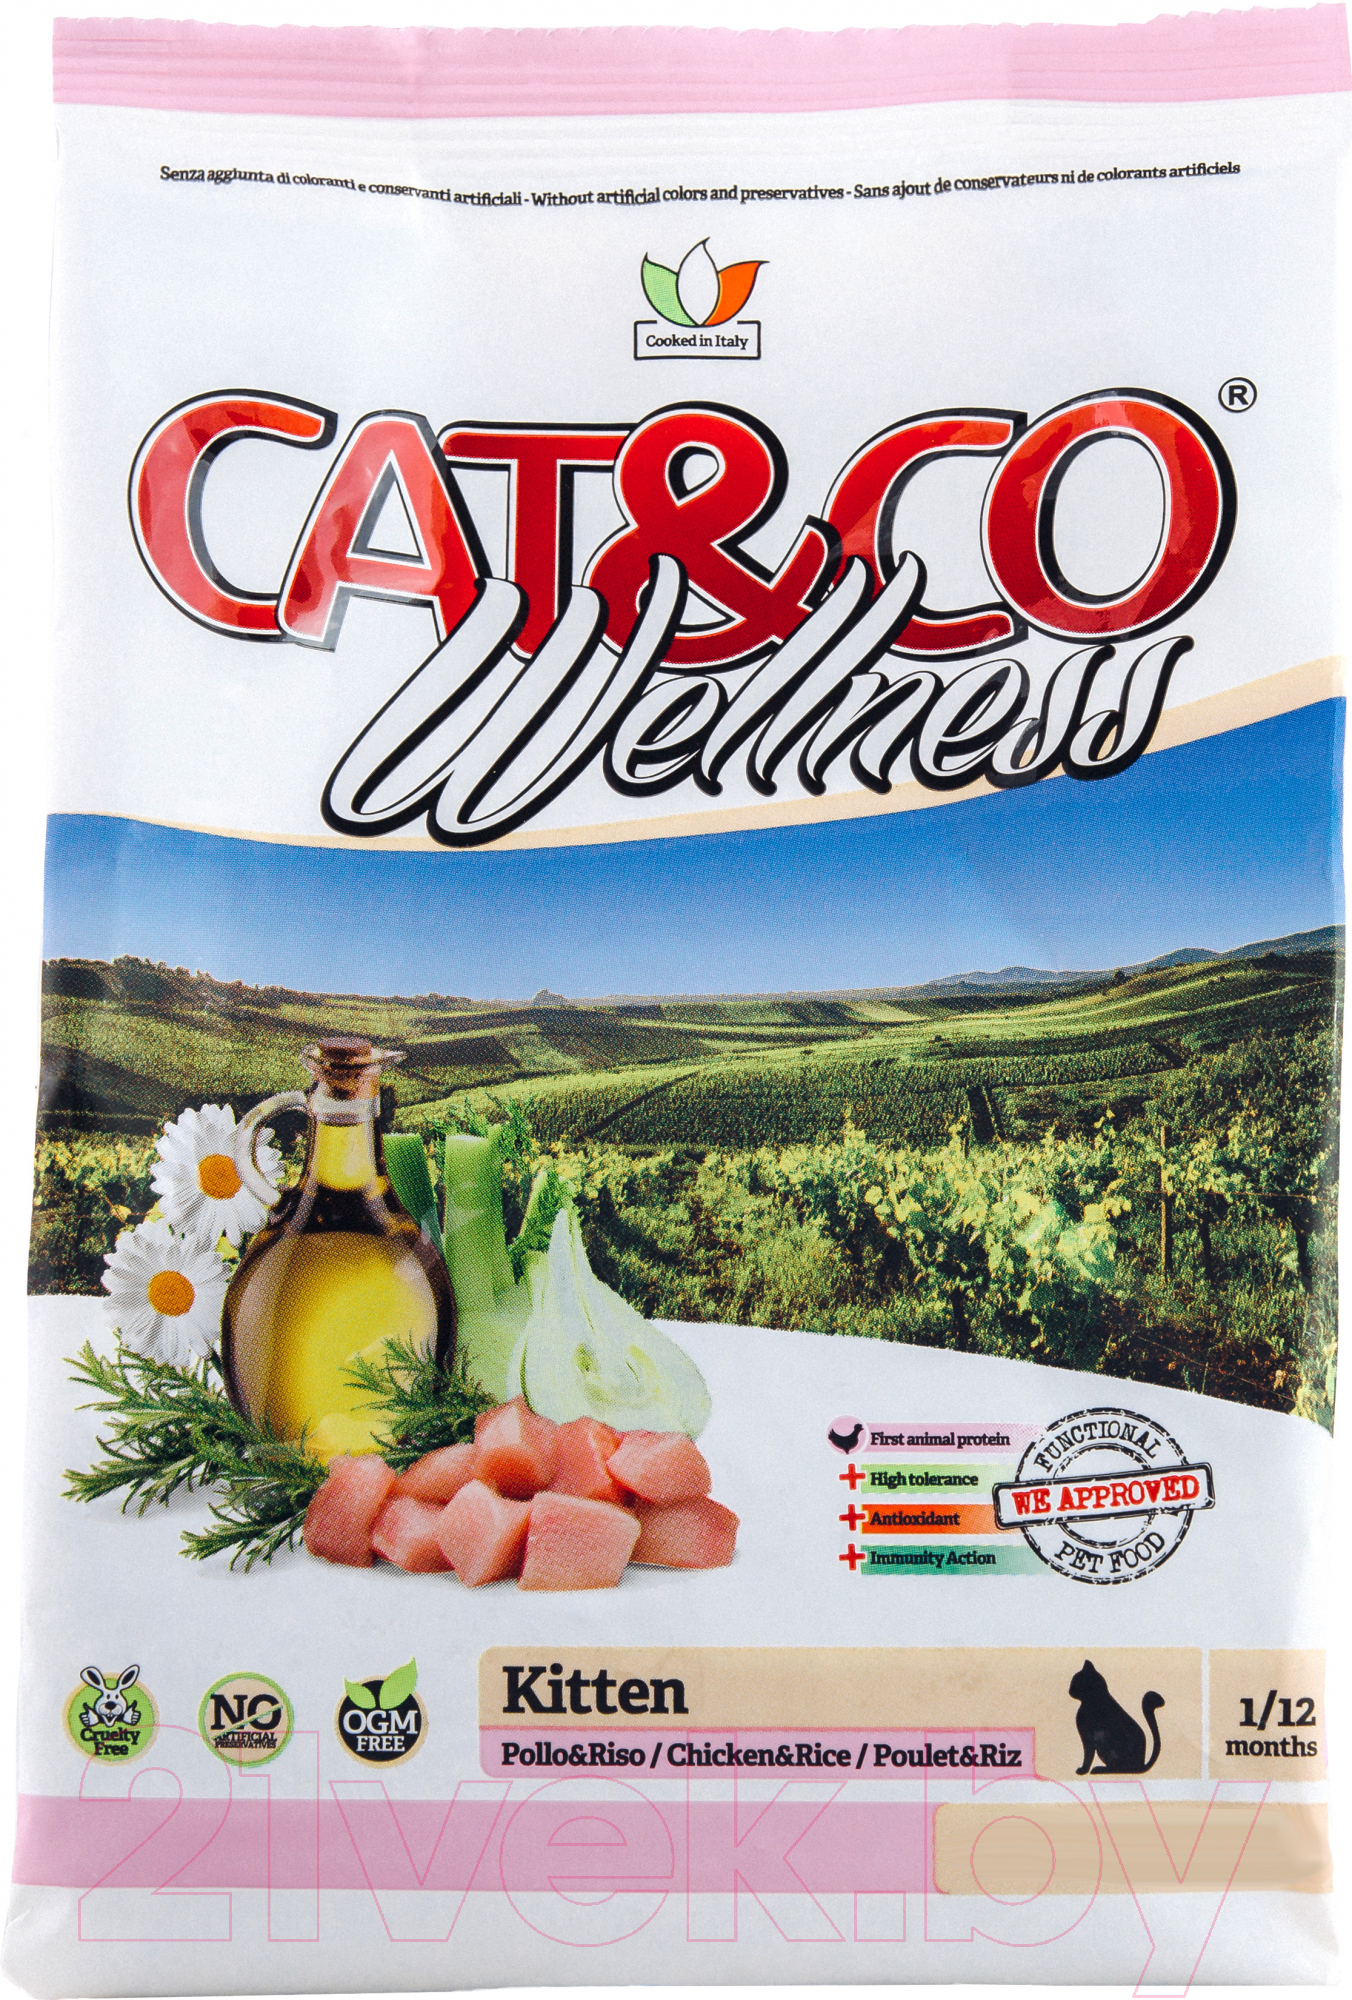 Купить Корм для кошек Adragna, Cat&Co Wellness Kitten Chicken&Rice (10кг), Италия